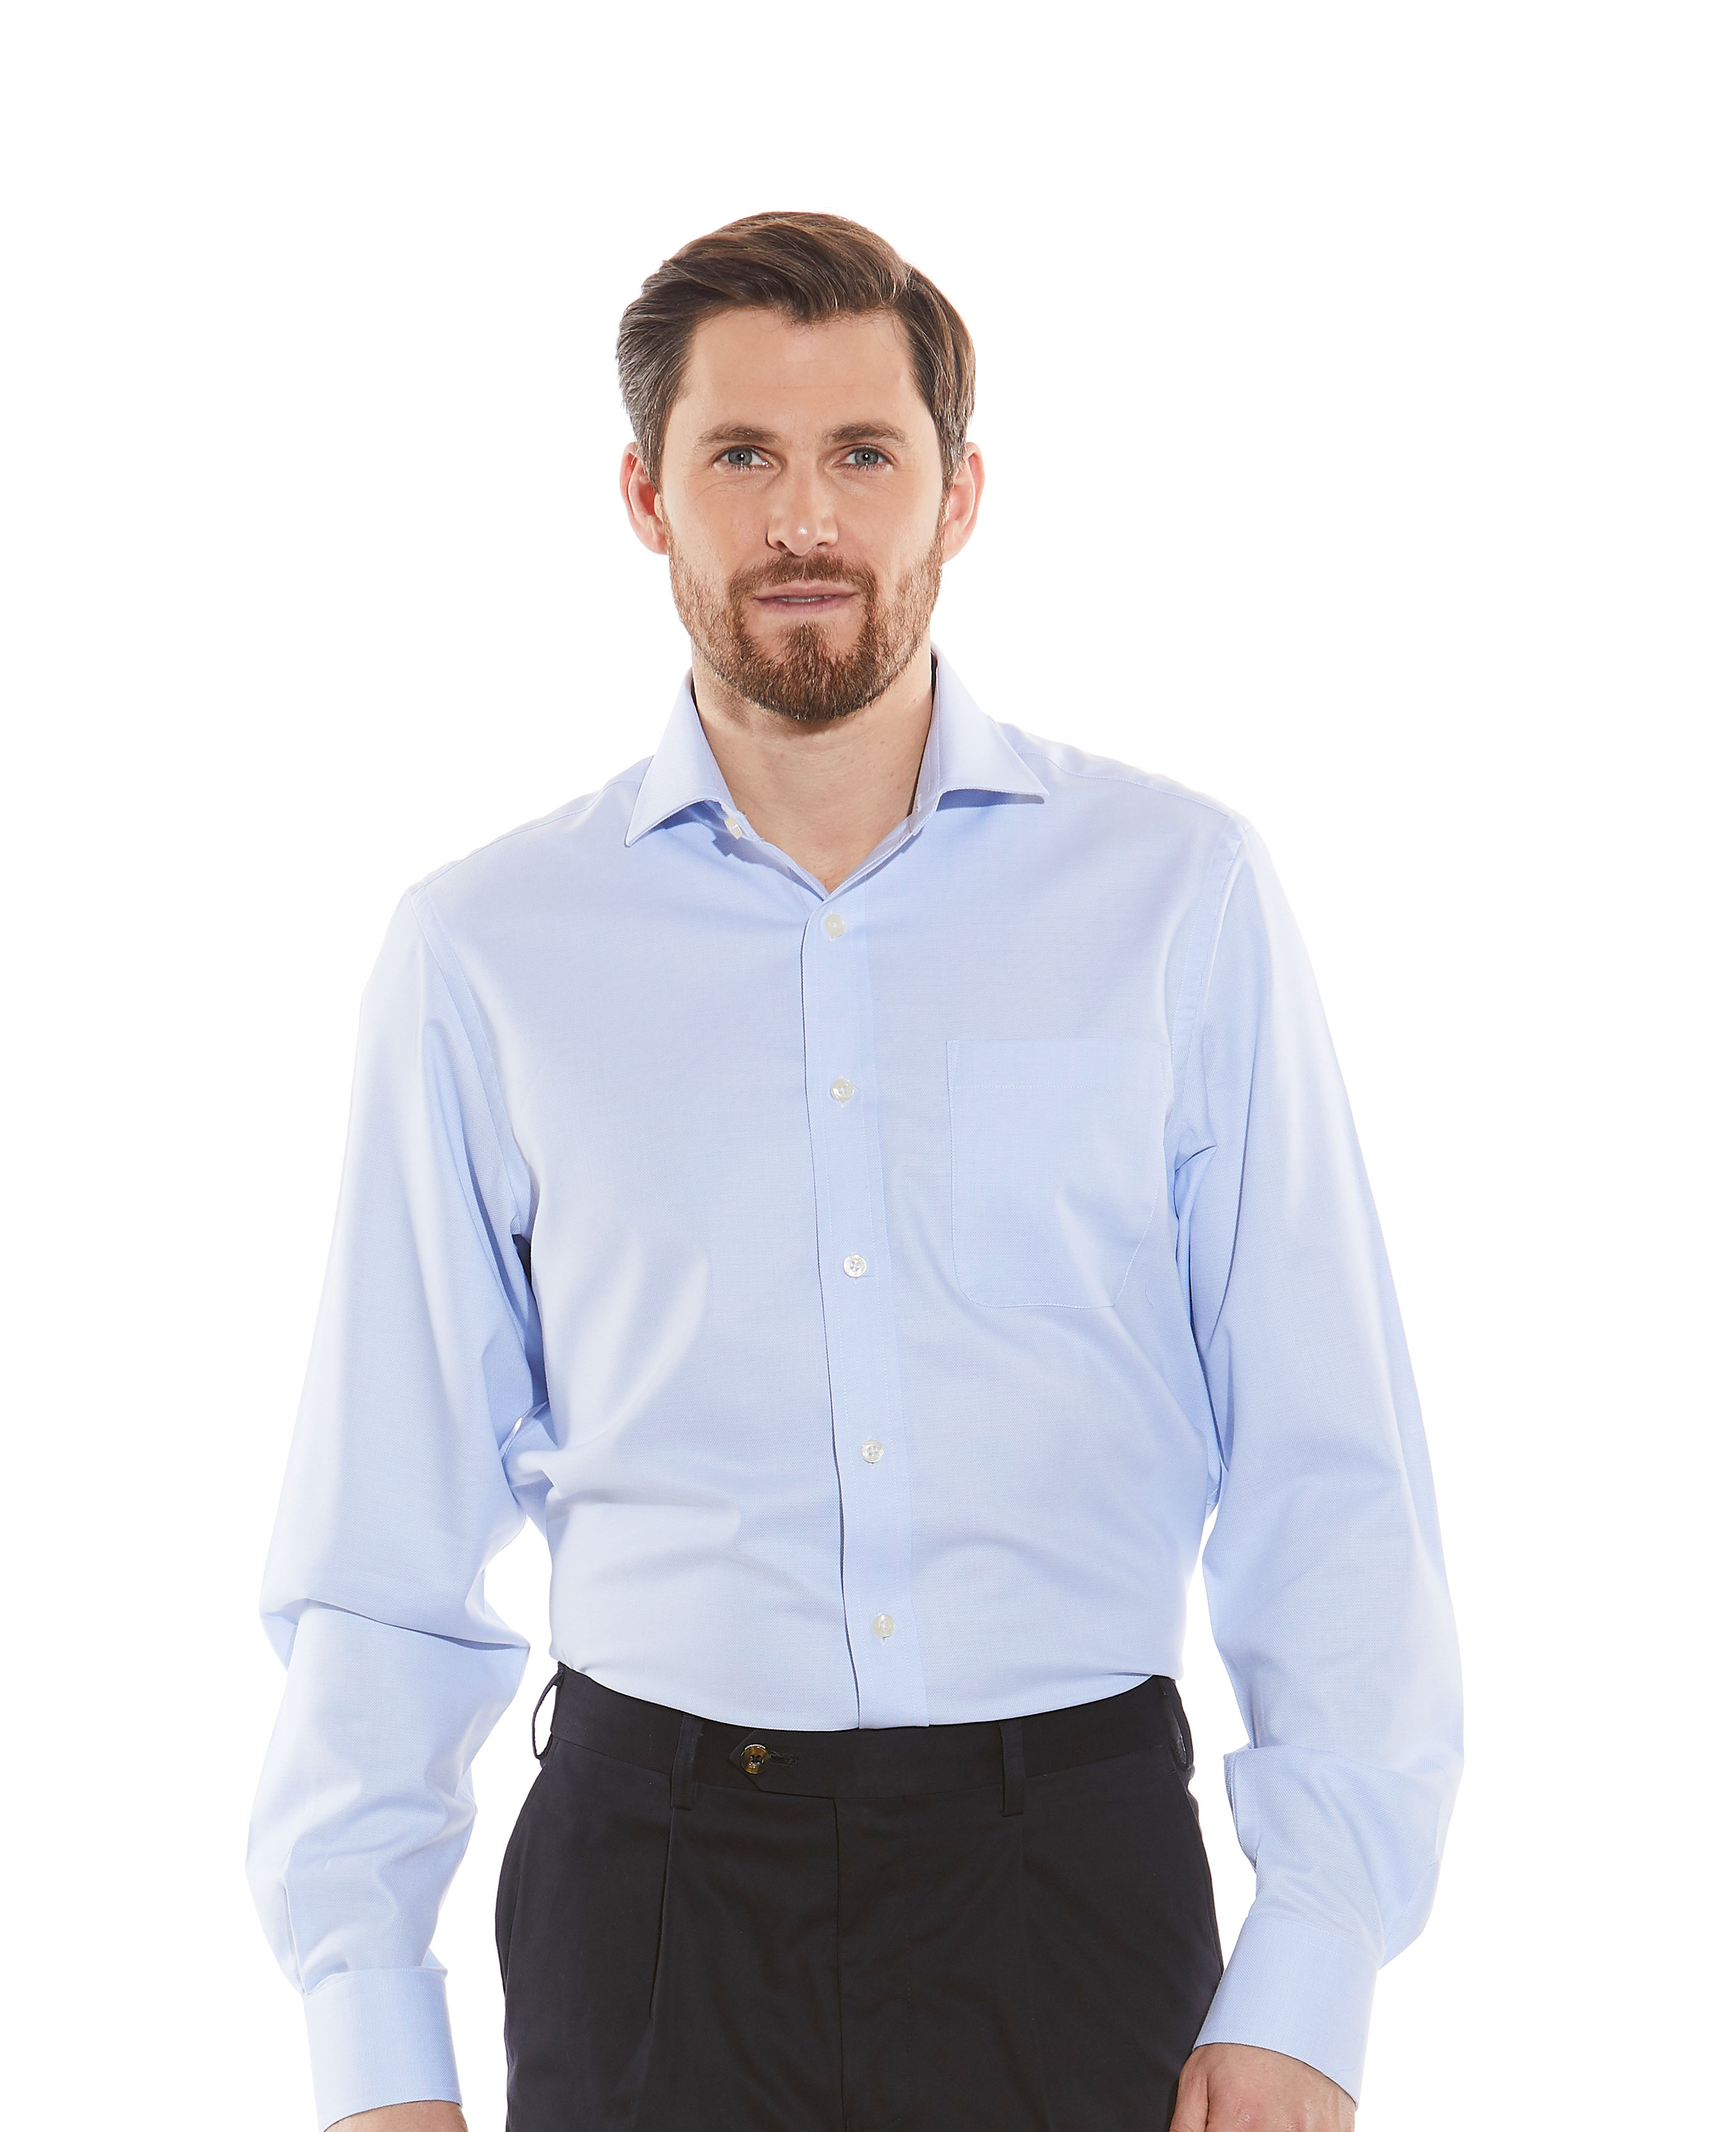 Savile-Row-Men-039-s-Sky-Blue-Textured-Dobby-Classic-Fit-Casual-Shirt-Single-Cuff